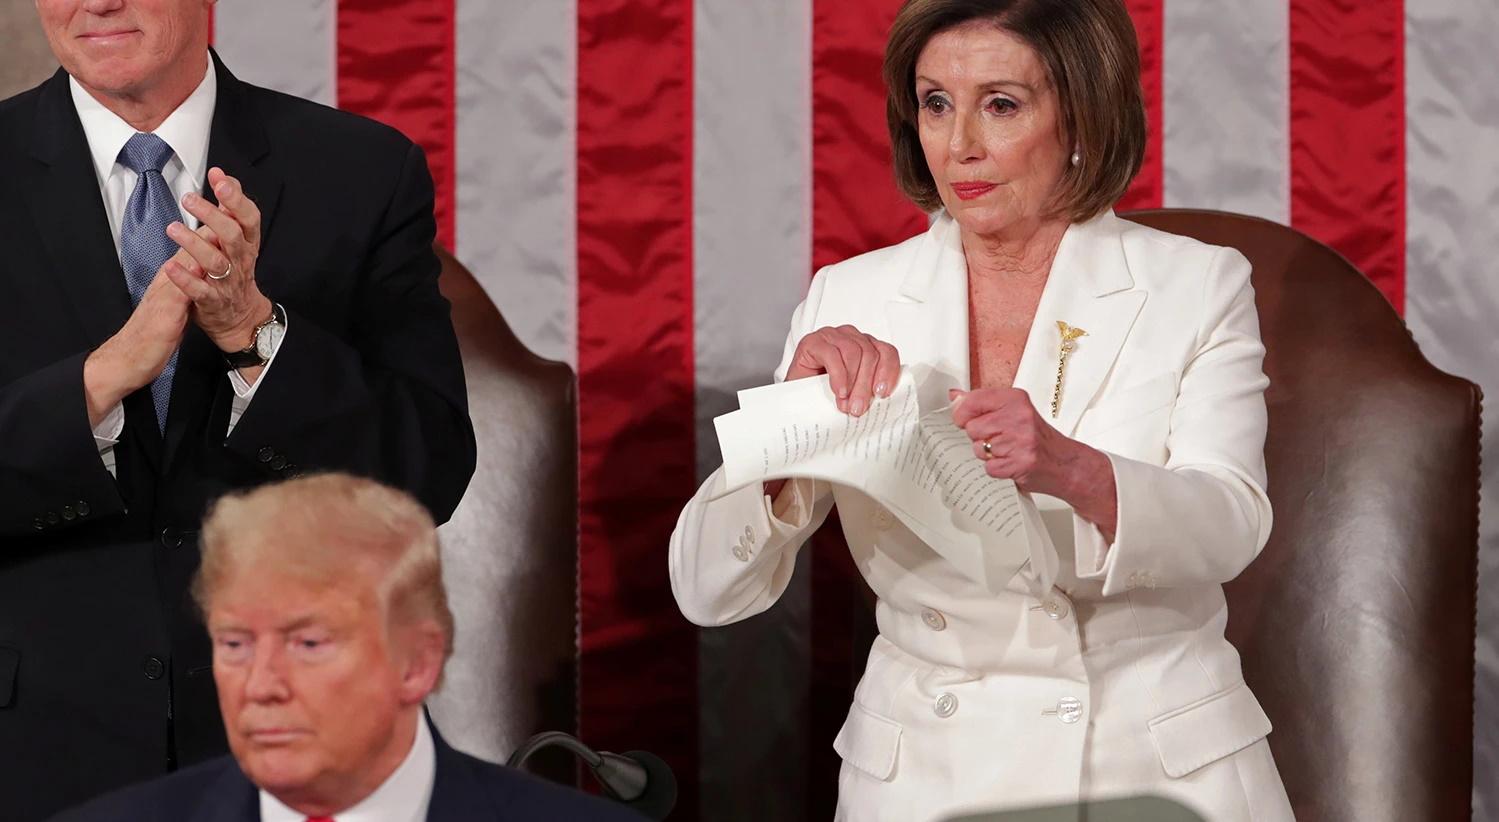 Pelosi: rasga discurso de Trump em pleno congresso